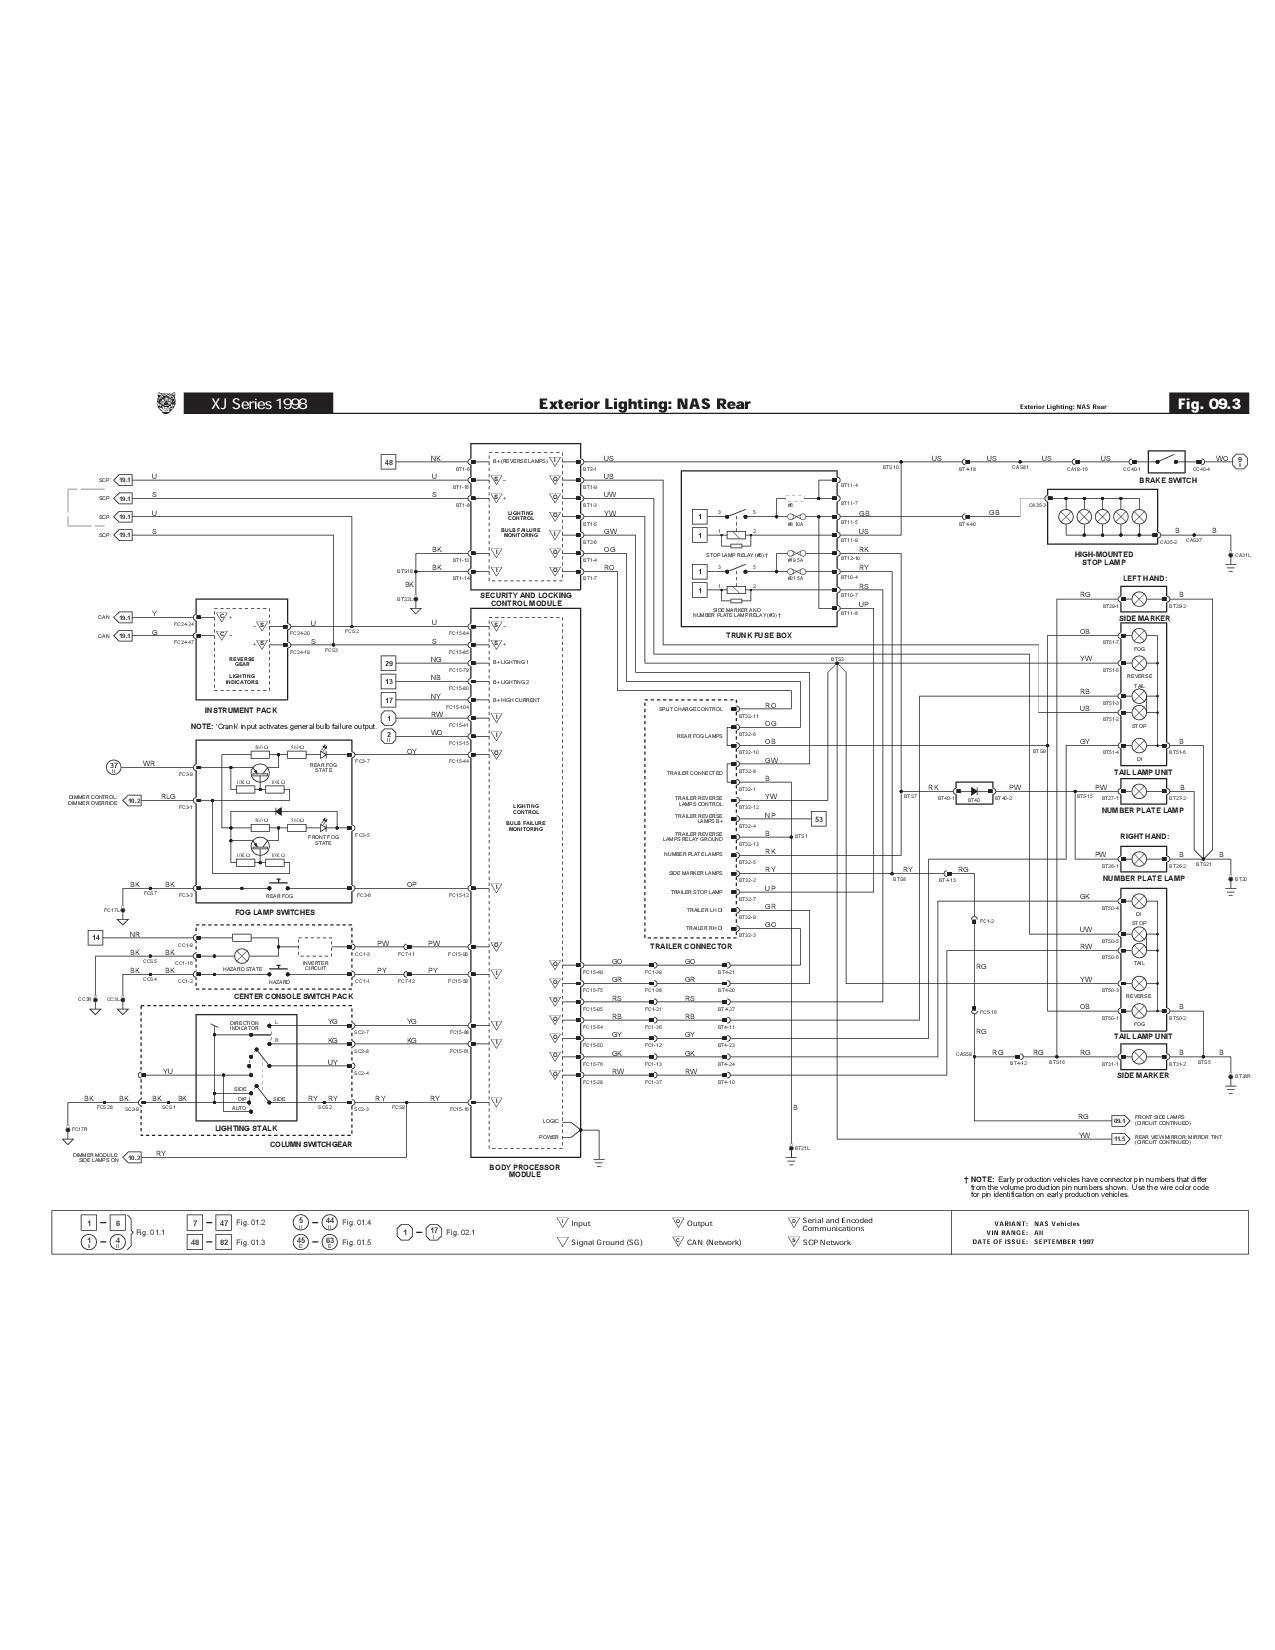 2001 mitsubishi eclipse radio wiring diagram furthermore 2007 hhr fuse